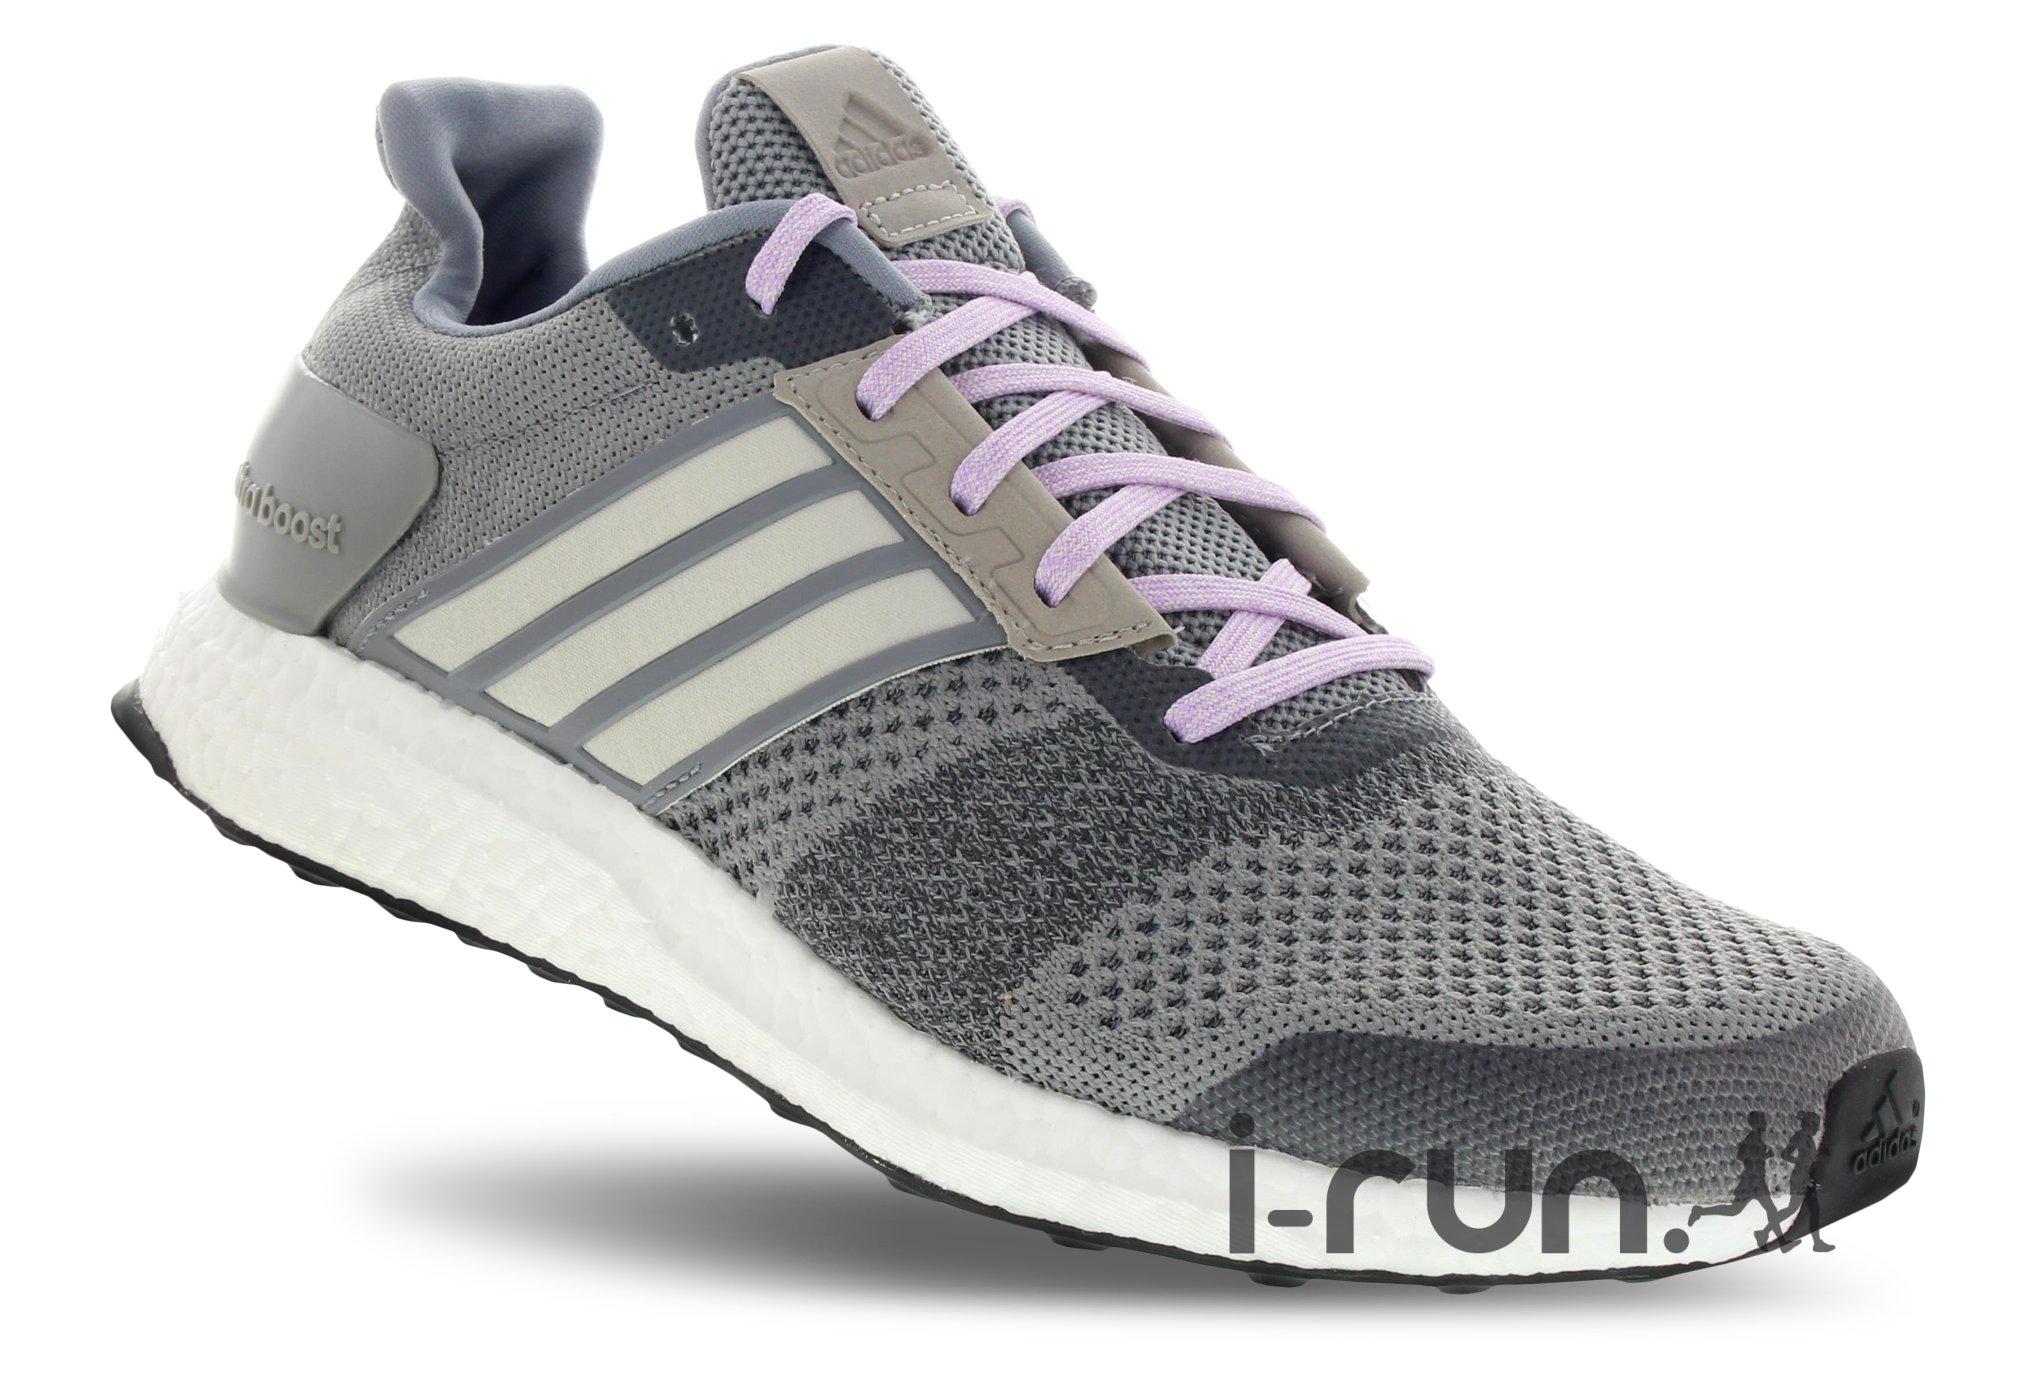 adidas ultra boost chaussure femme